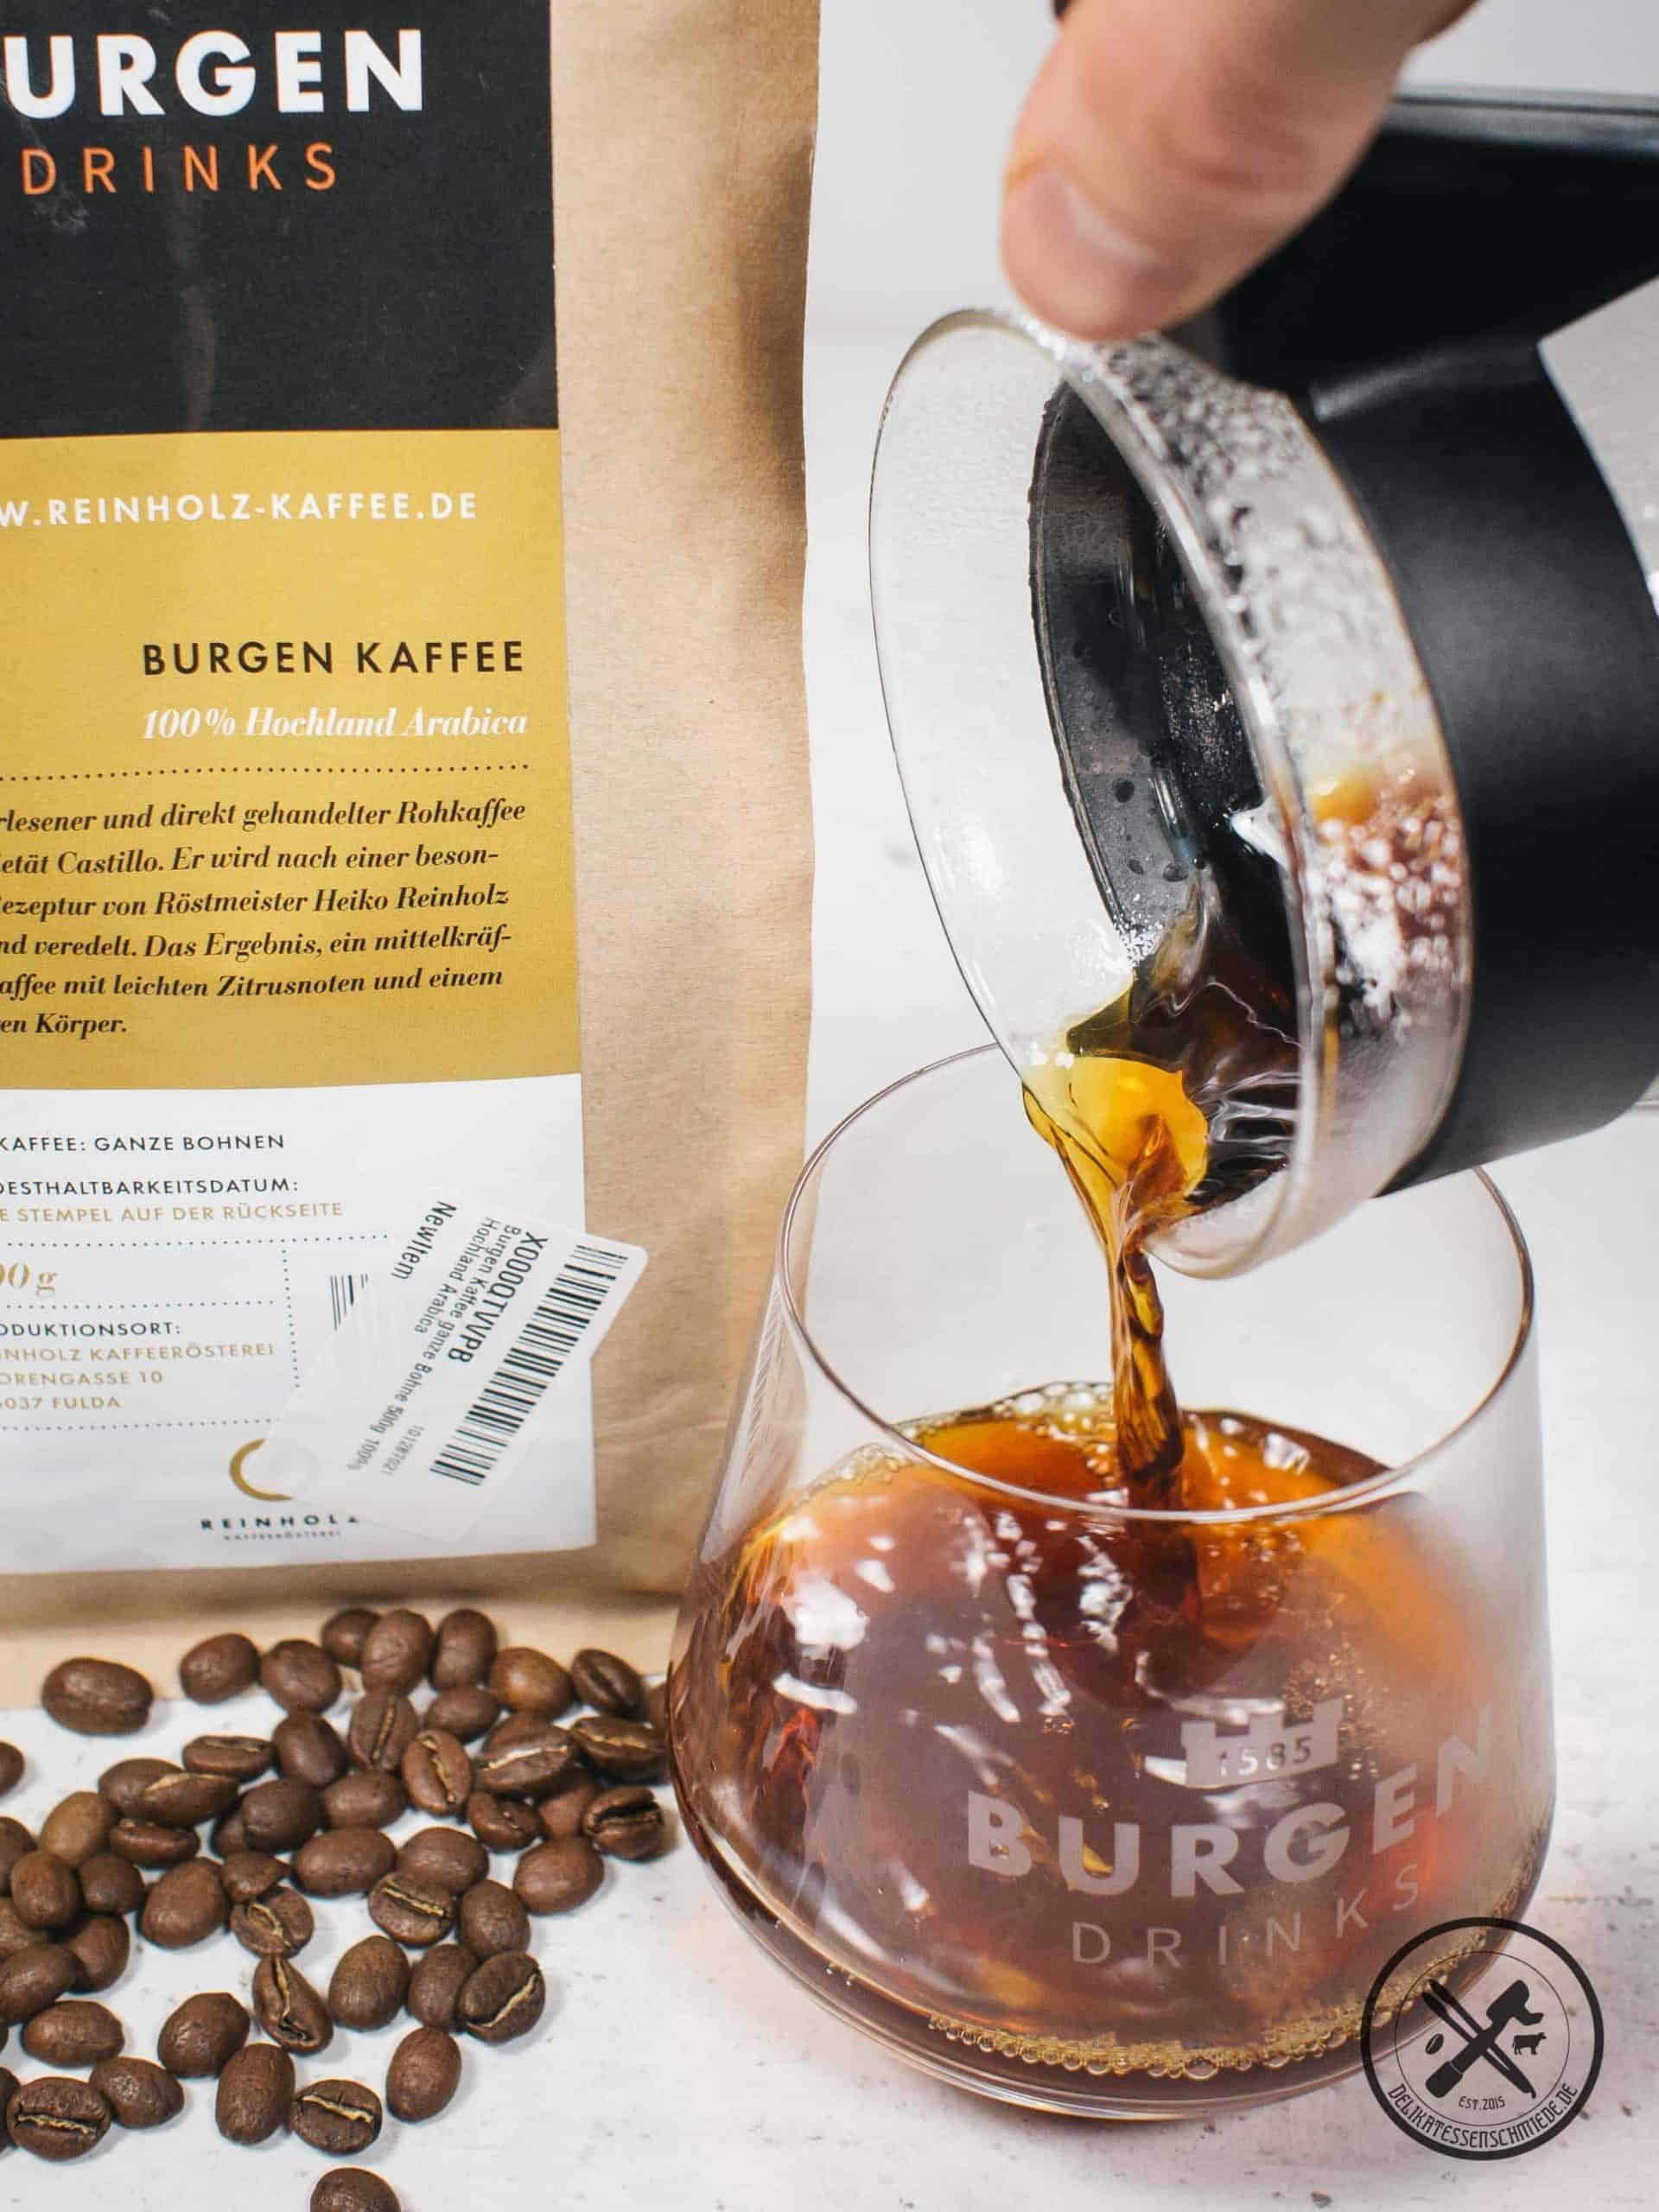 Burgen_Kaffee-3